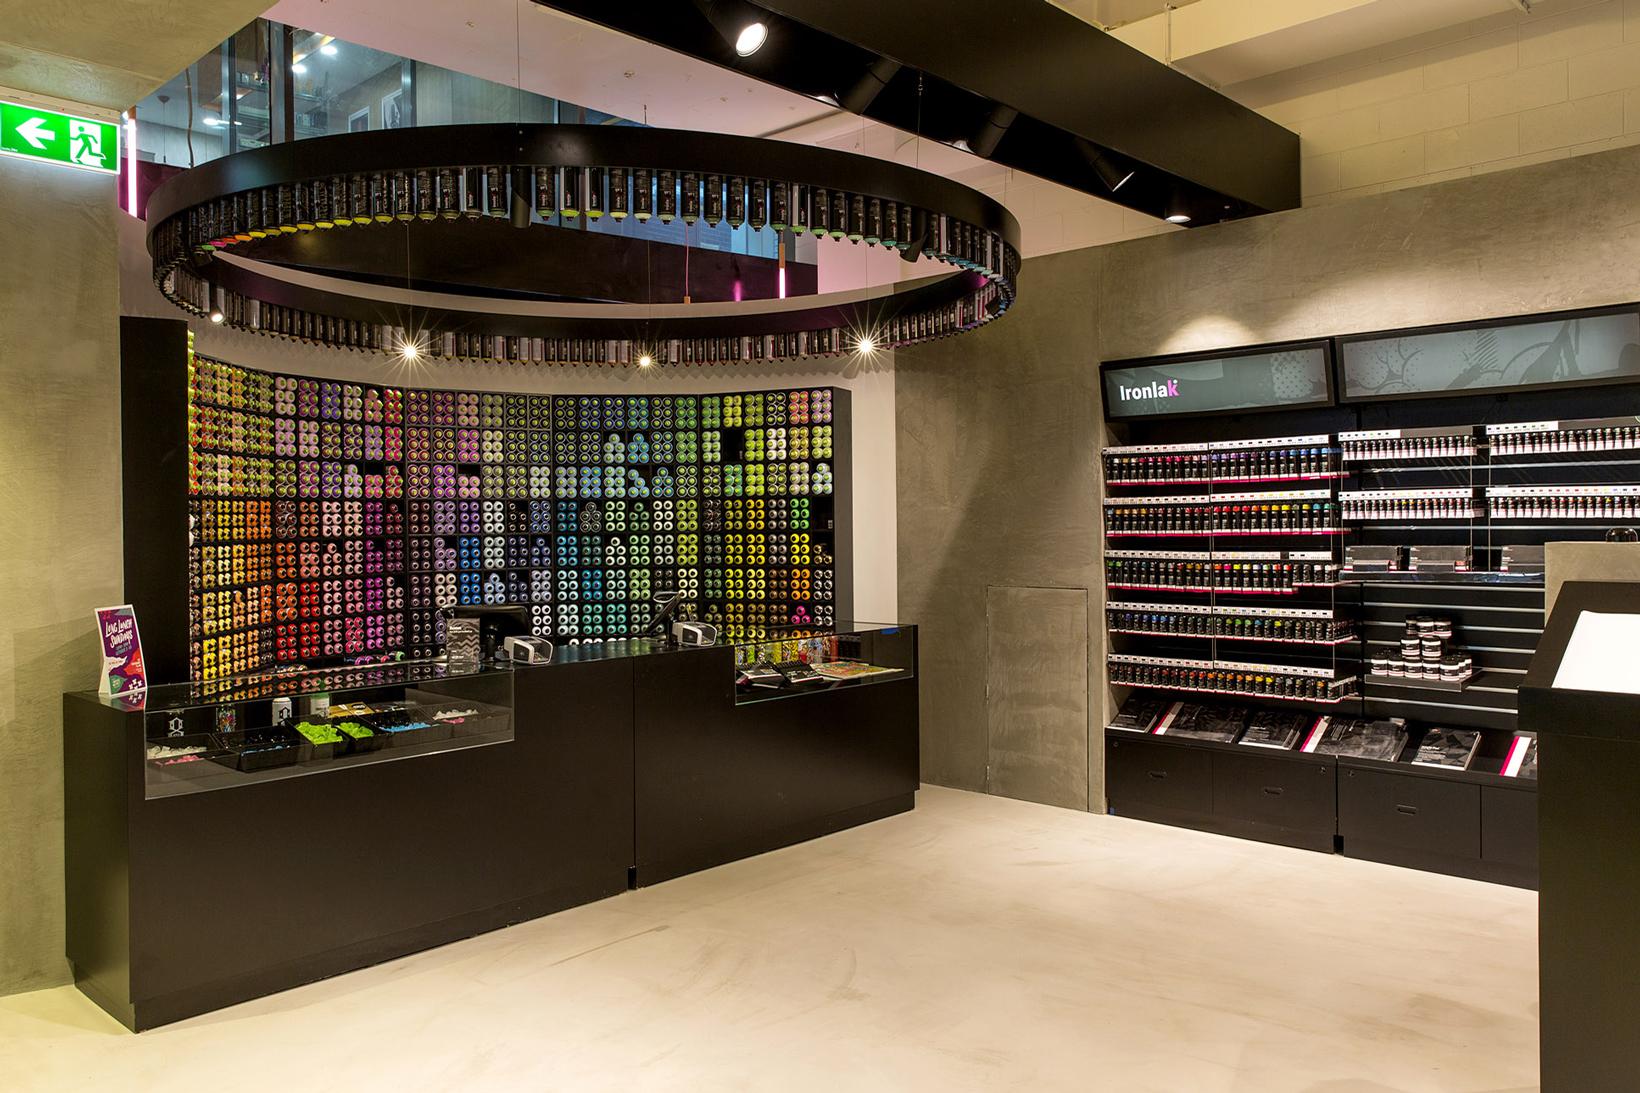 Ironlak Art & Design Sydney Flagship Store - 1765454